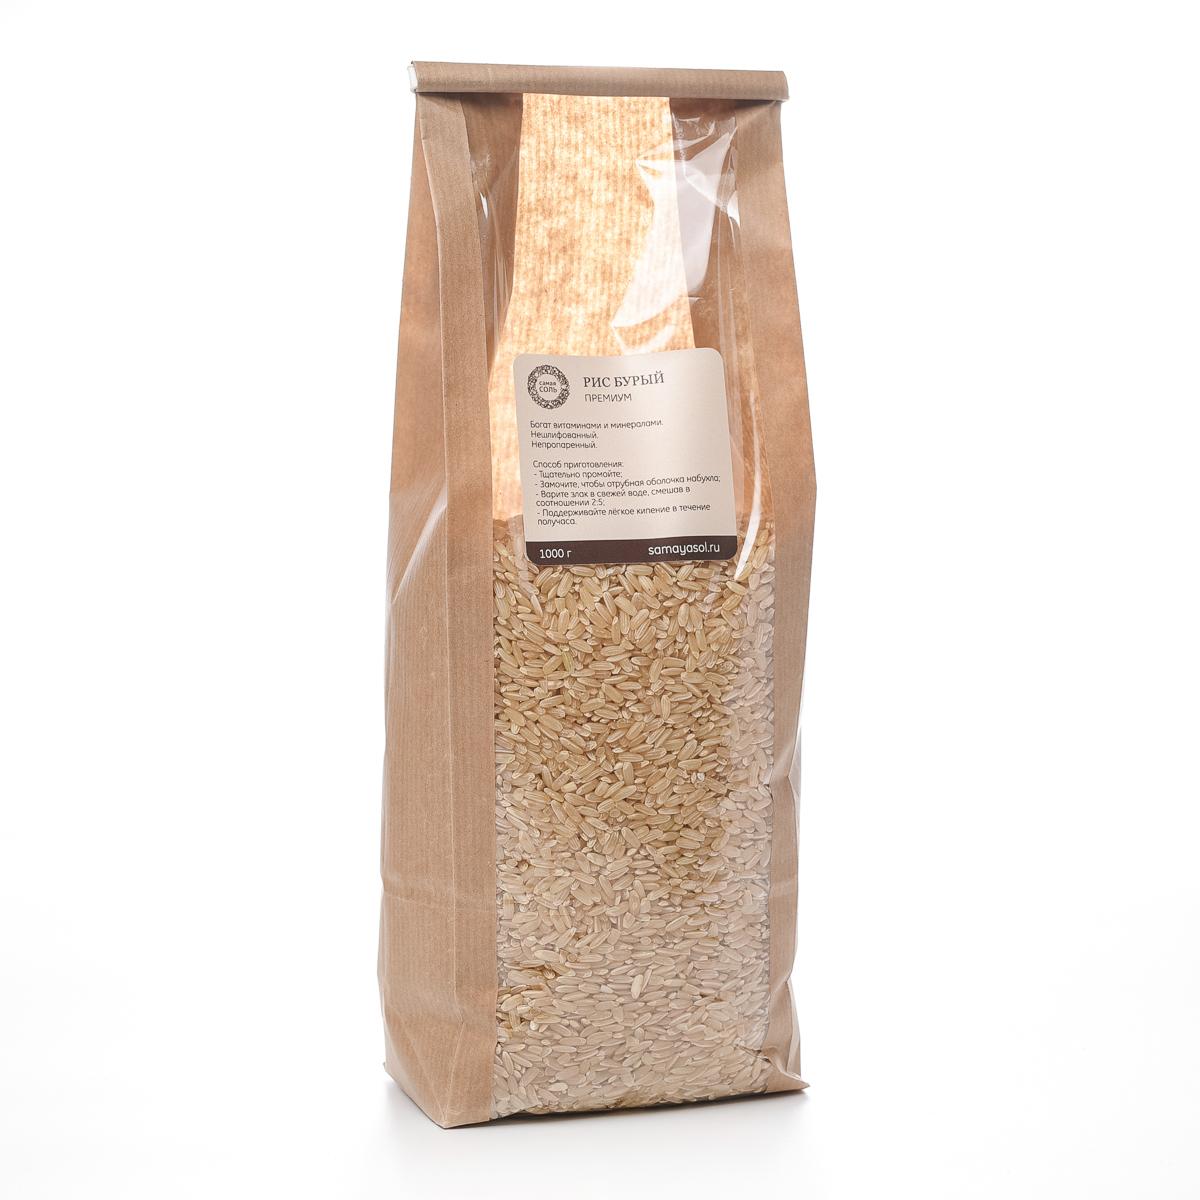 Рис бурый органик